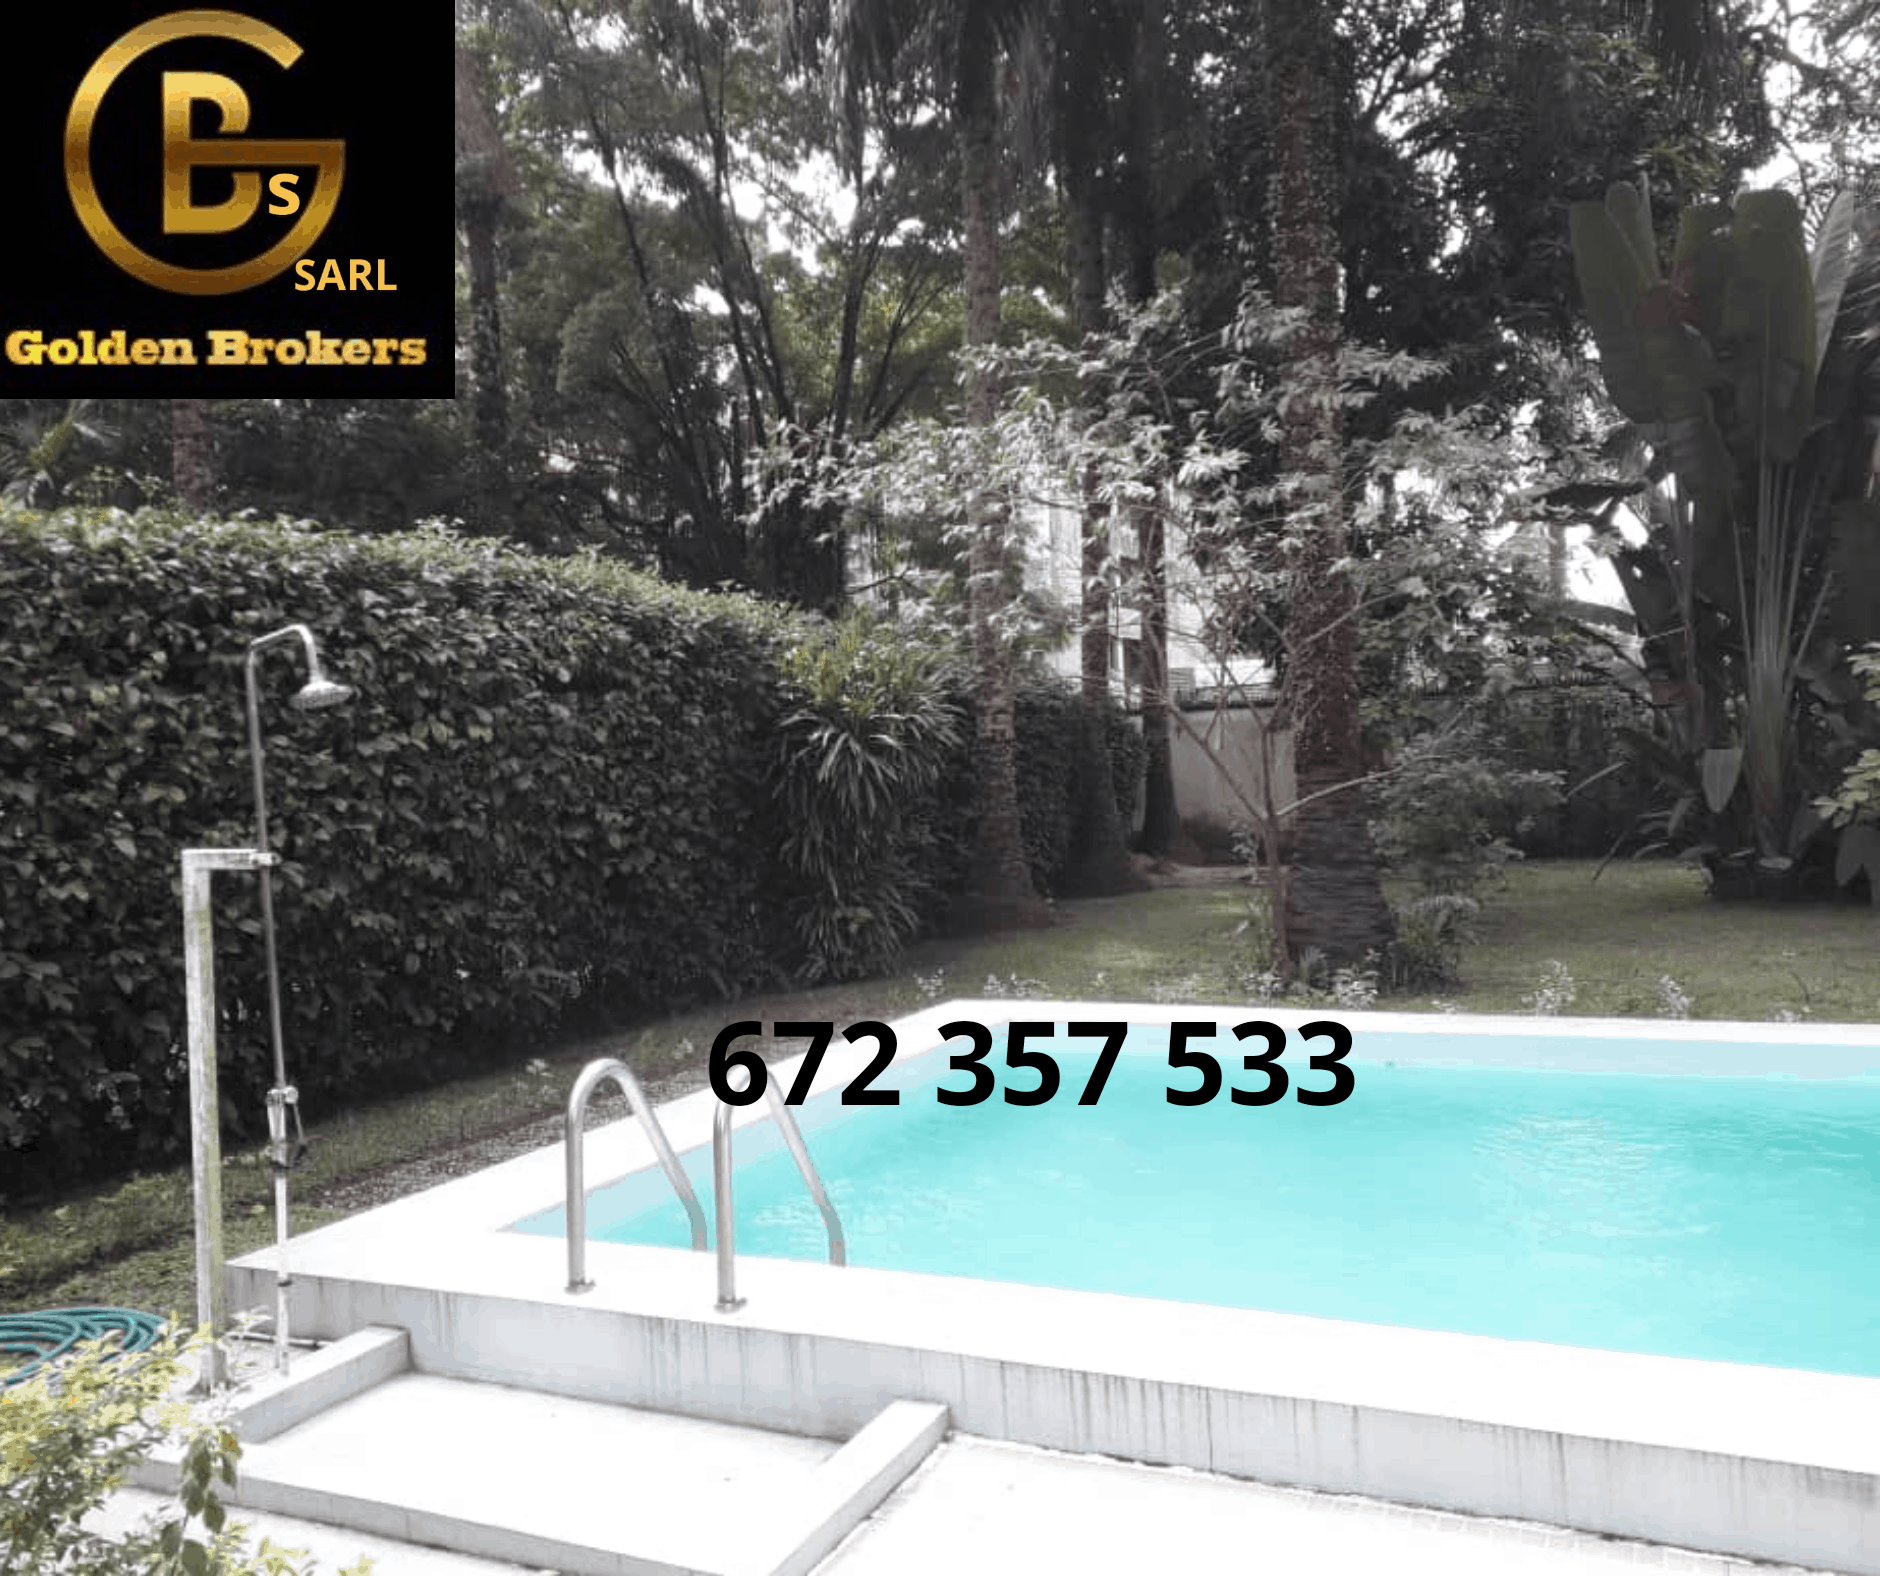 House (Duplex) to rent - Douala, Bonapriso, Dominique Savio primaire - 1 living room(s), 5 bedroom(s), 5 bathroom(s) - 3 000 000 FCFA / month